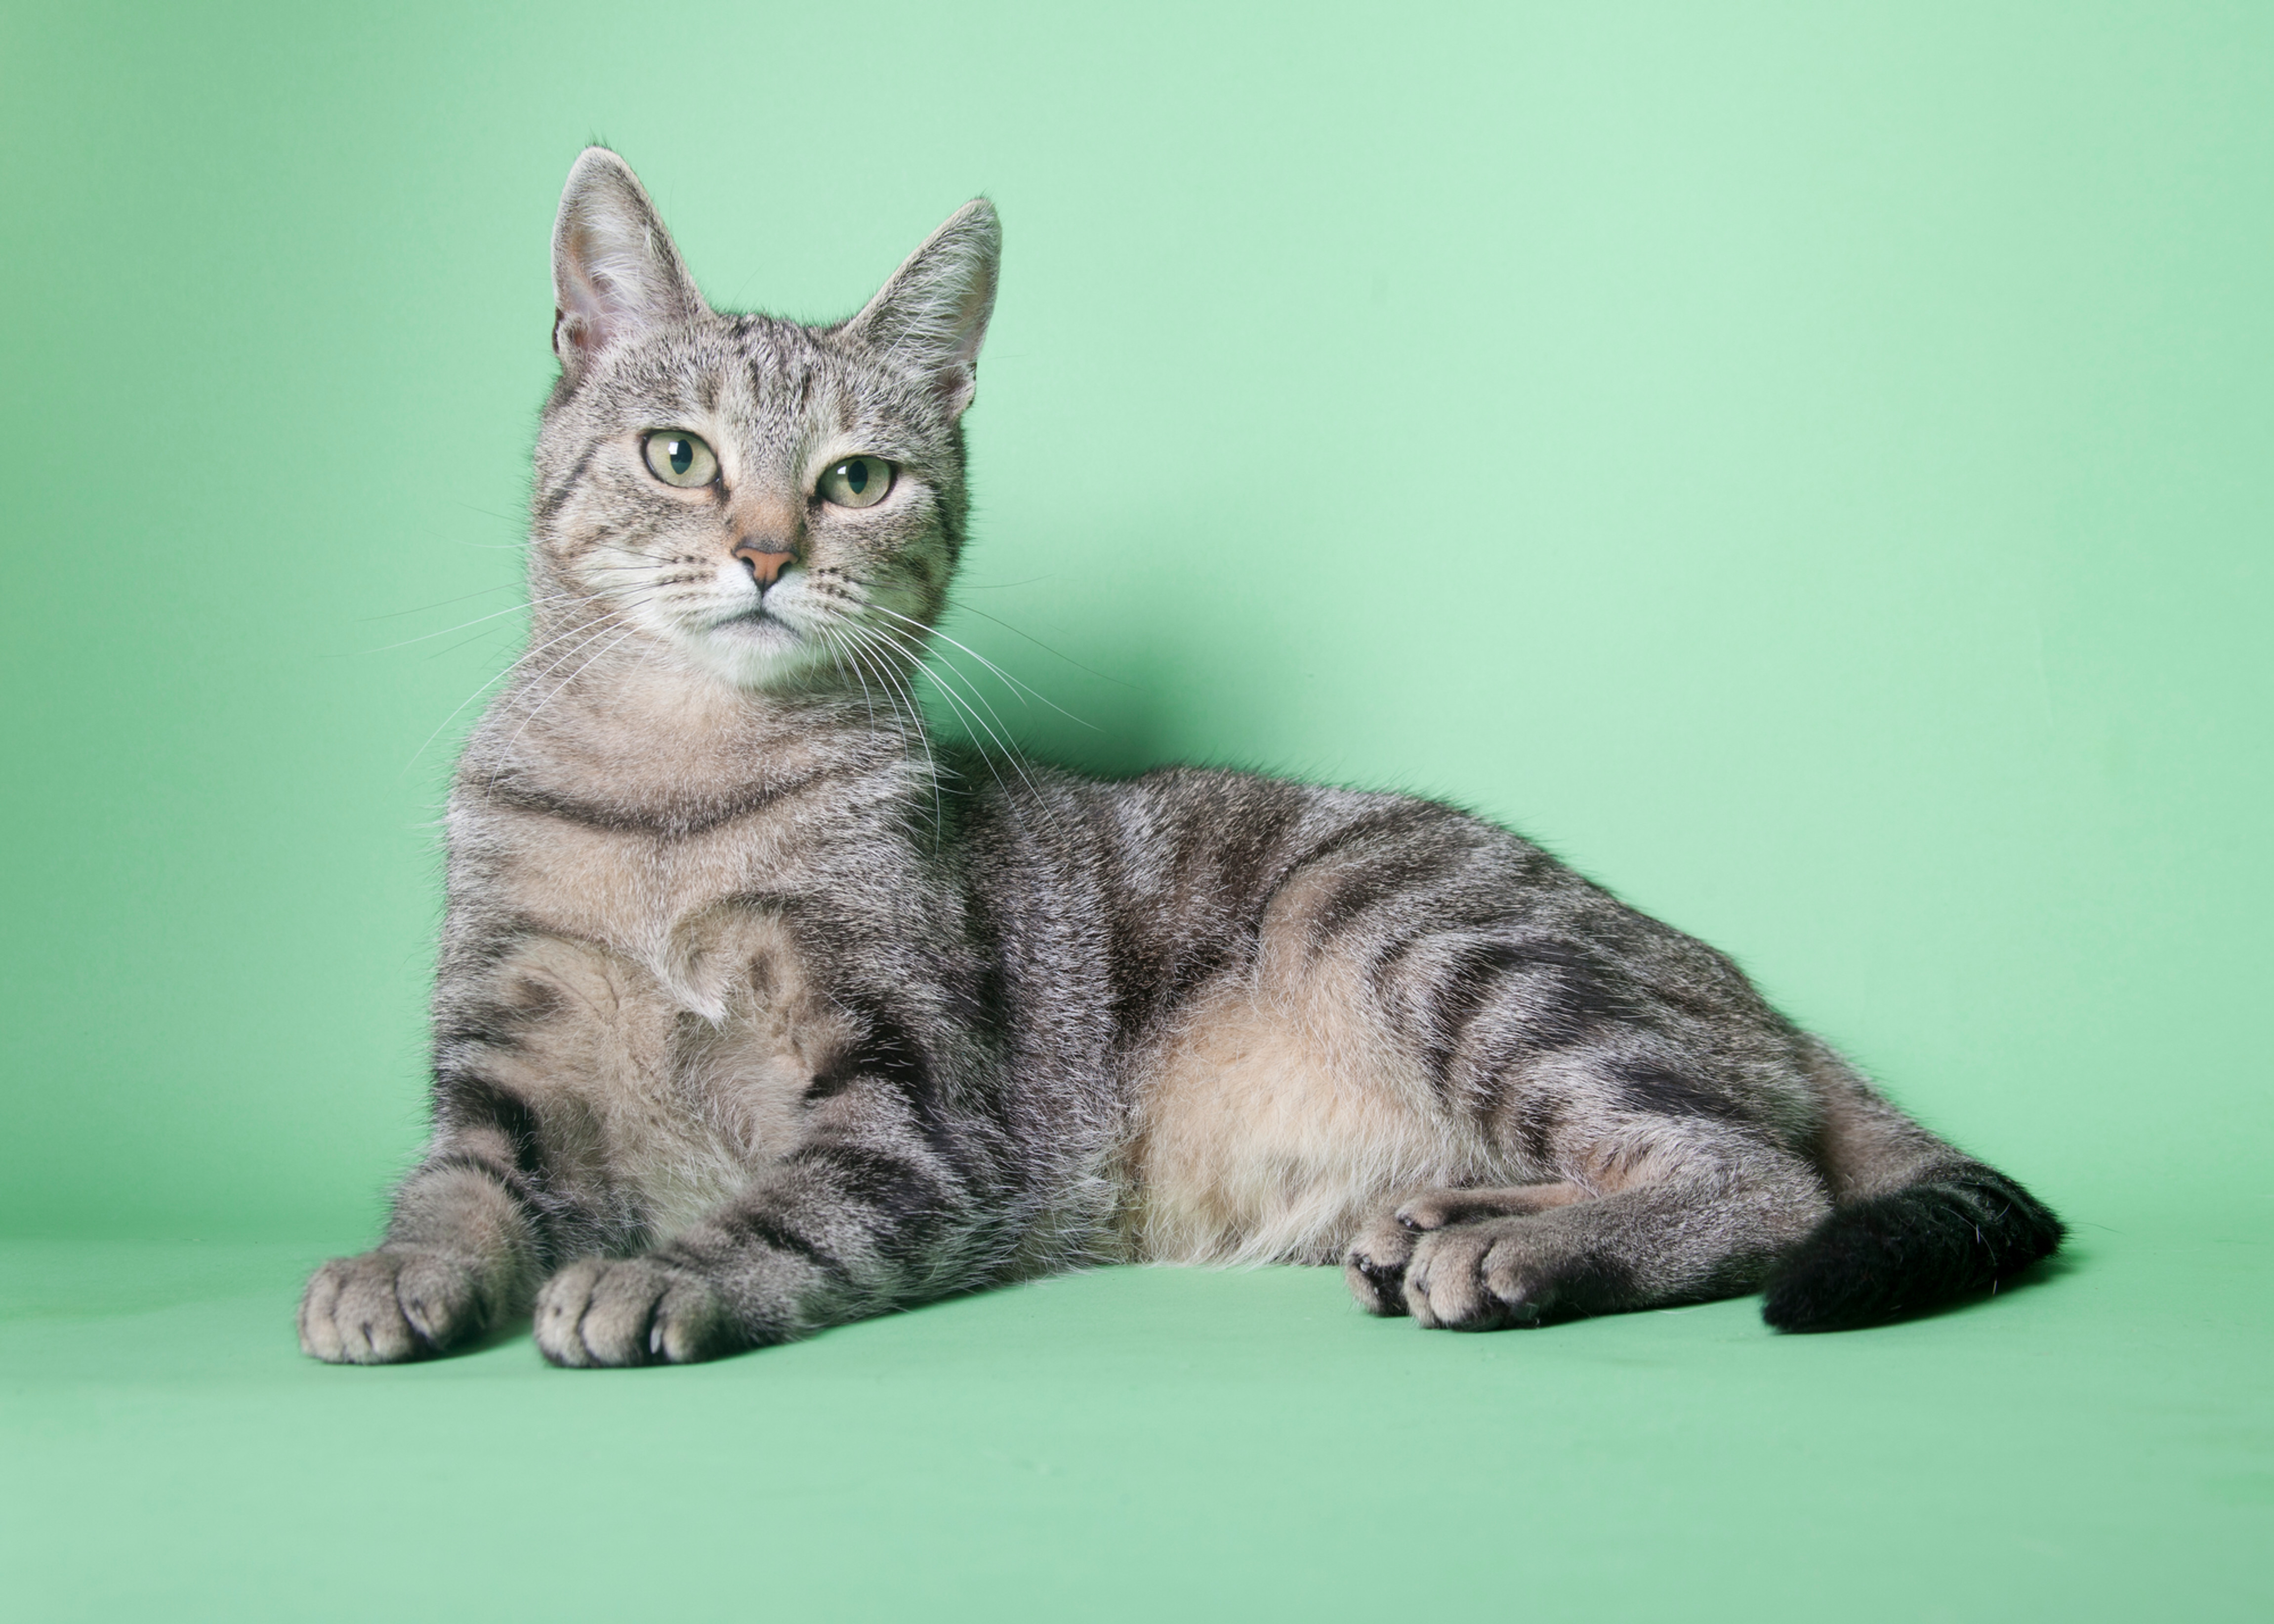 Tannrens katt